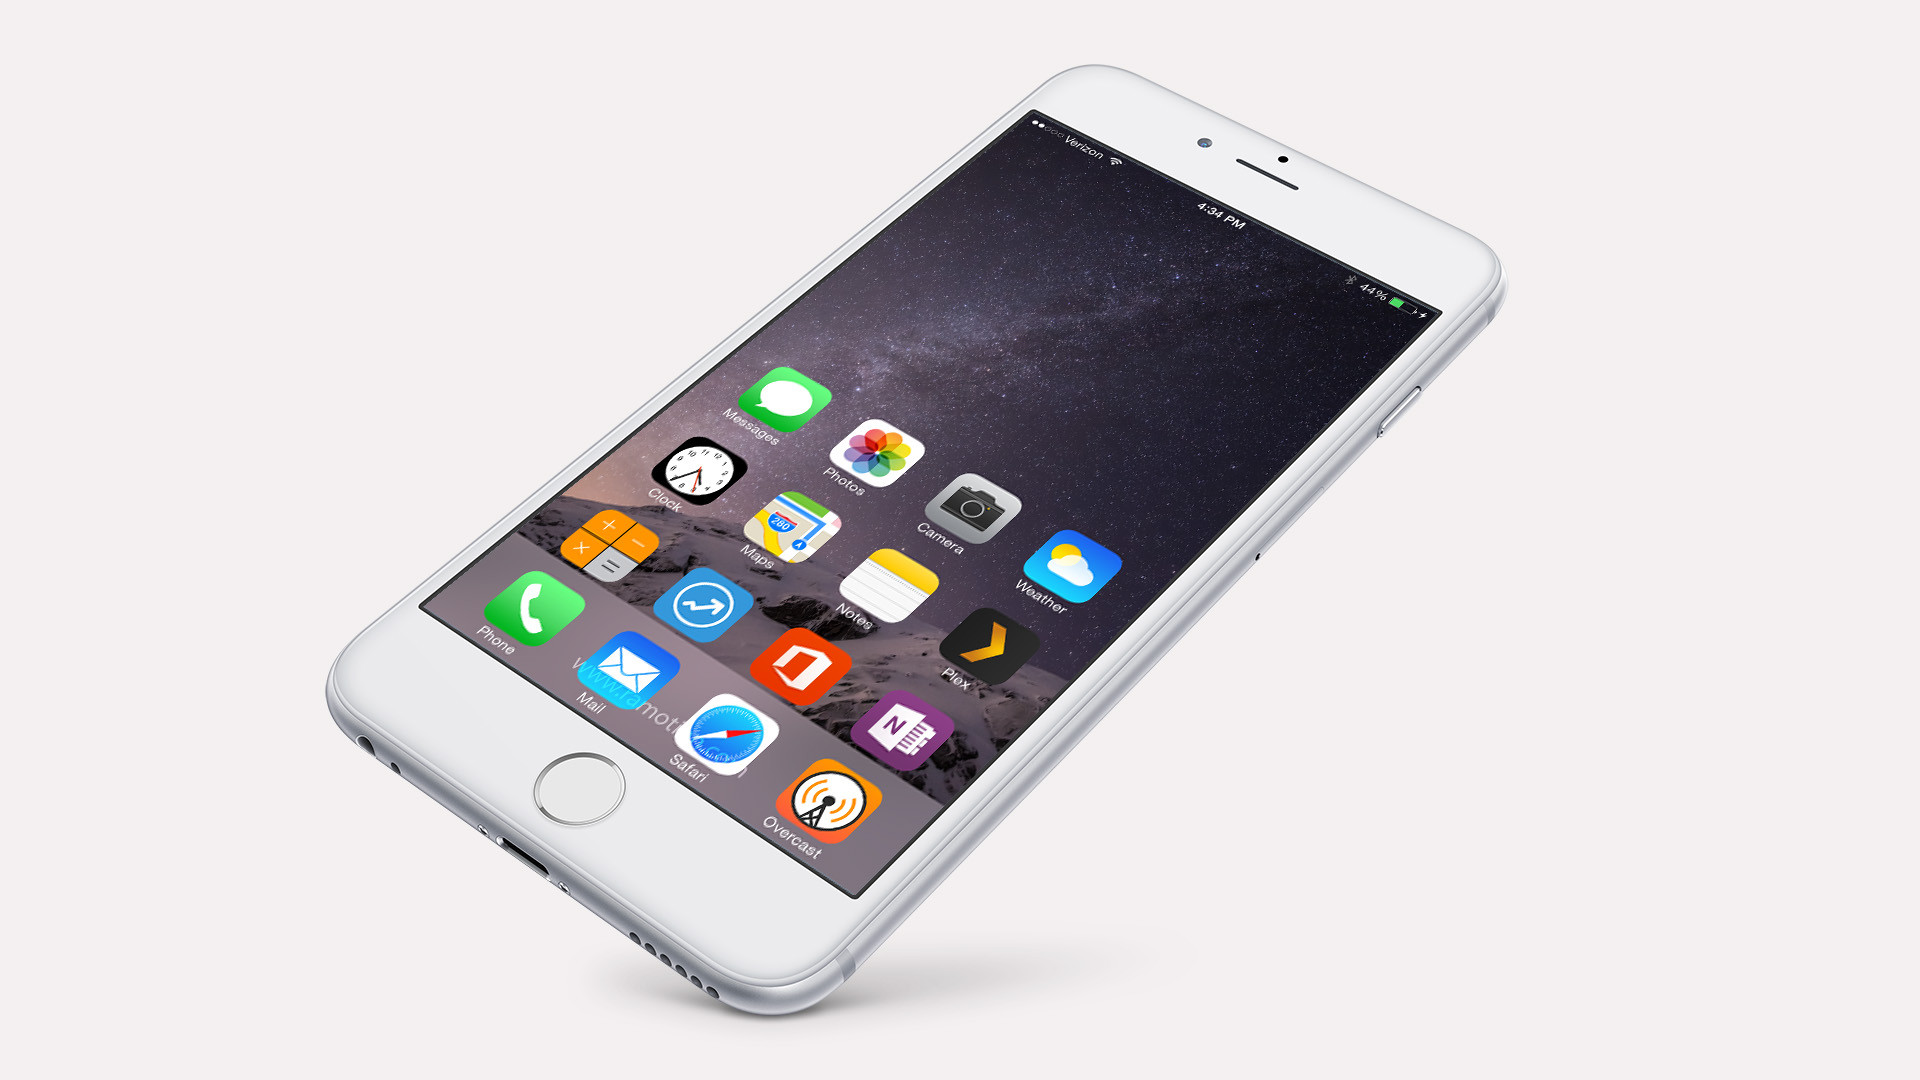 iphone-6-plus-reachability (1).jpg